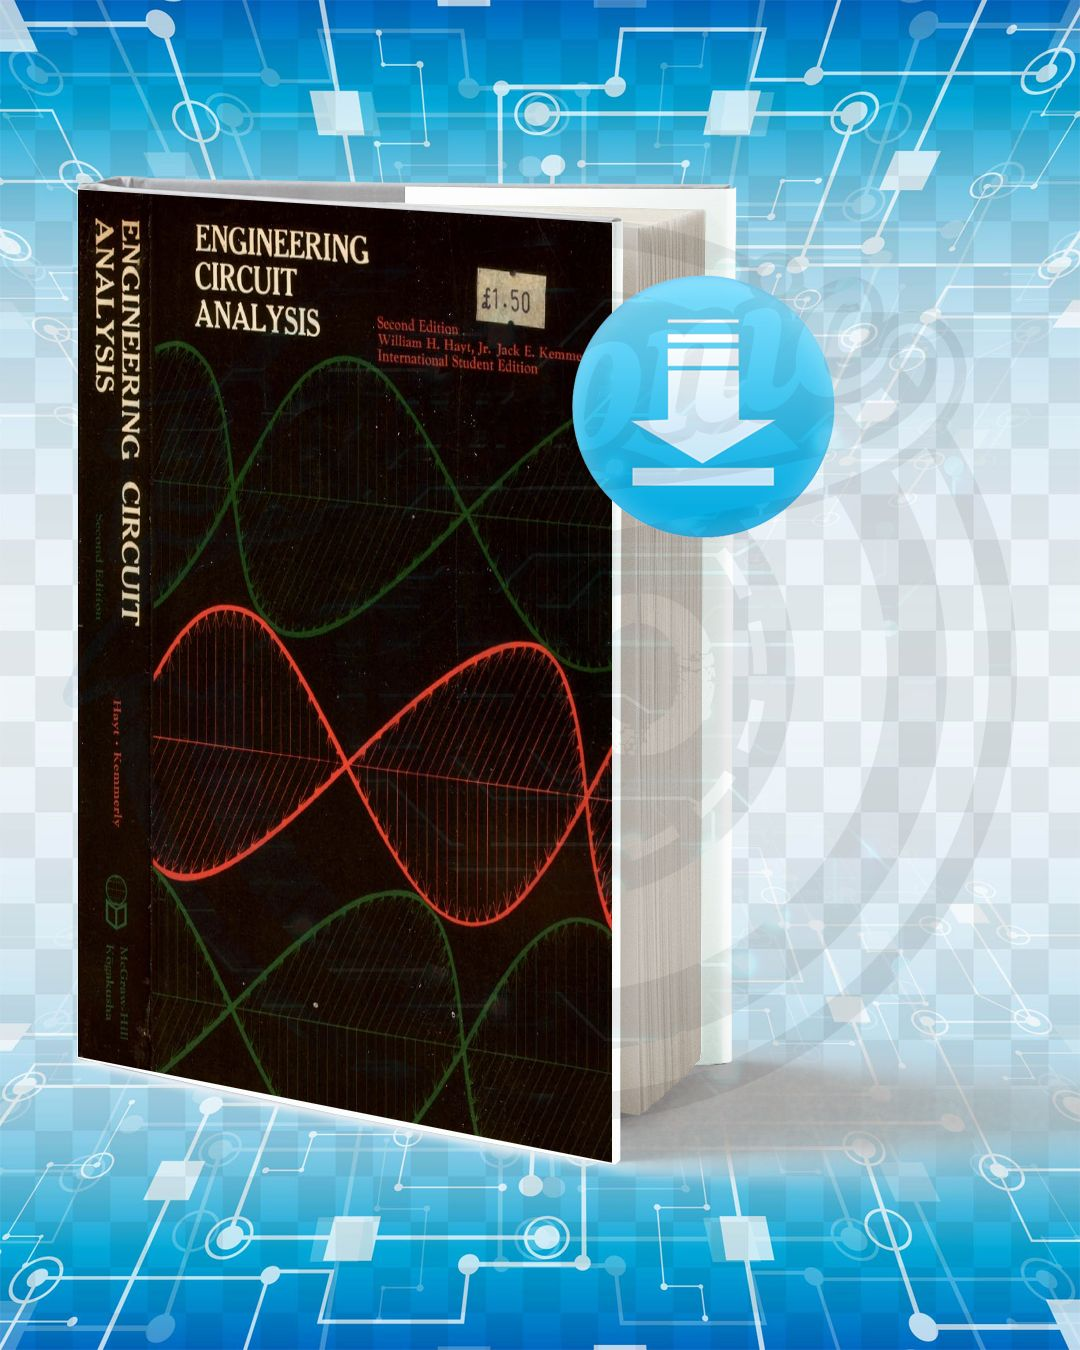 Download Engineering Circuit Analysis Engineering Robotics Books Circuit